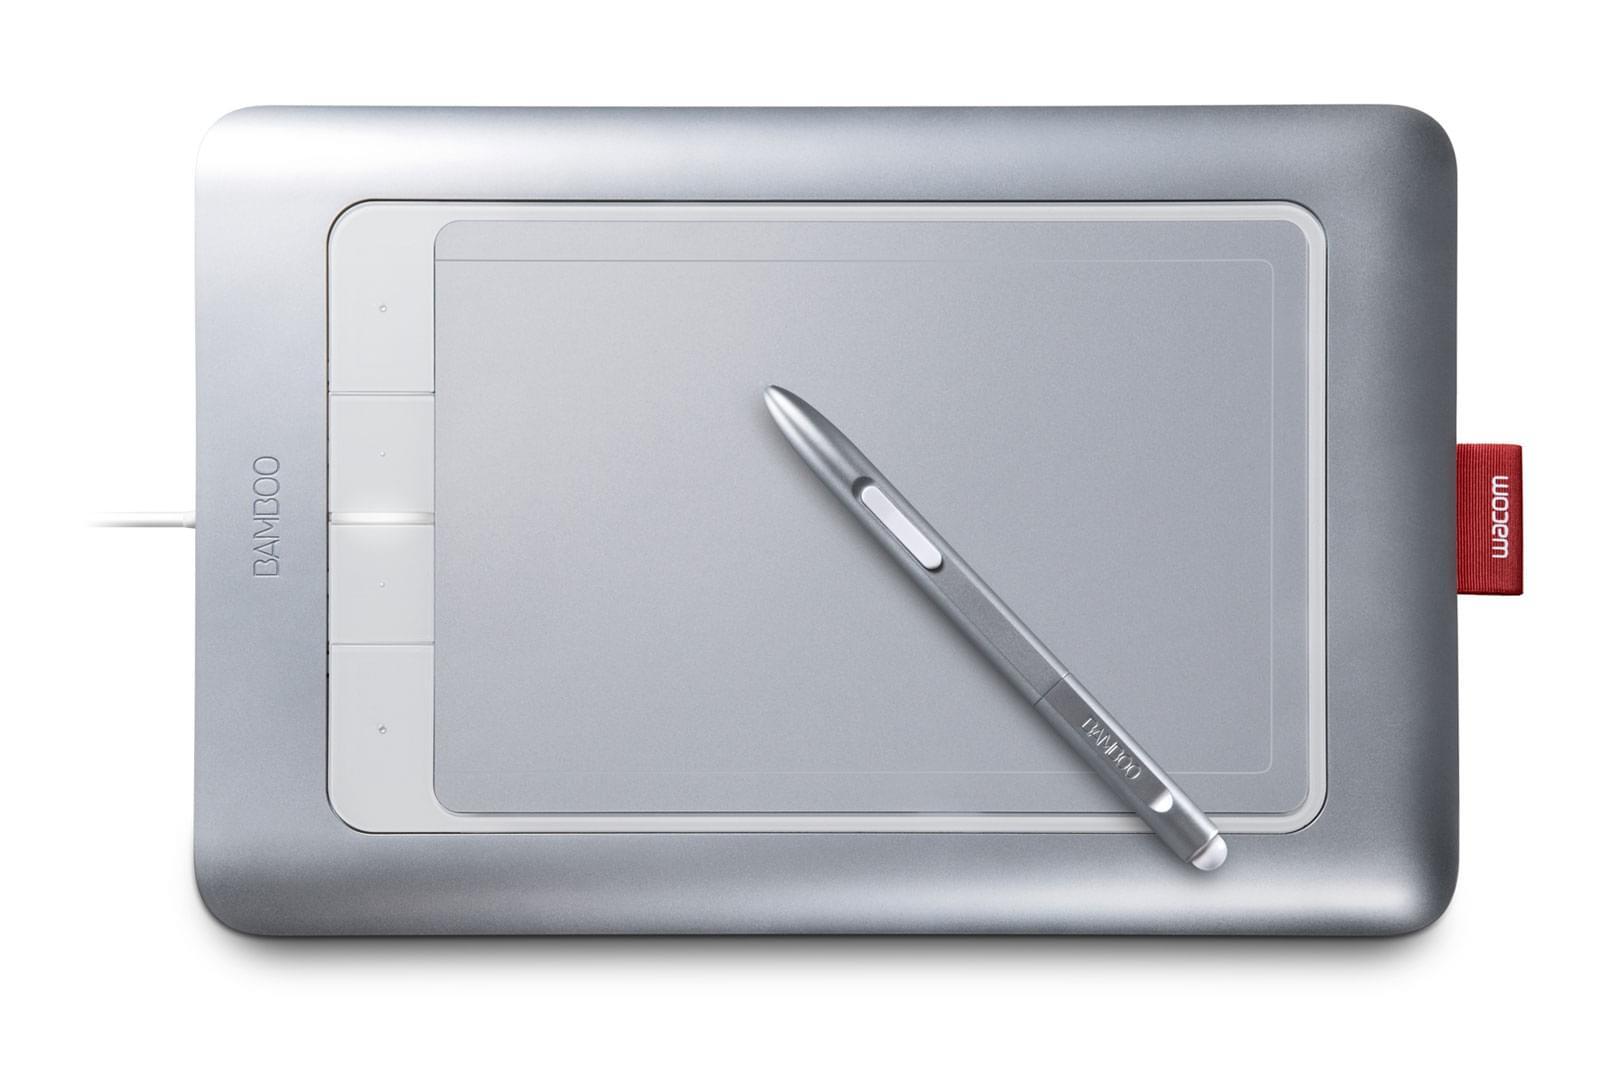 Wacom Bamboo Fun M Pen & Touch - Tablette graphique Wacom - 0